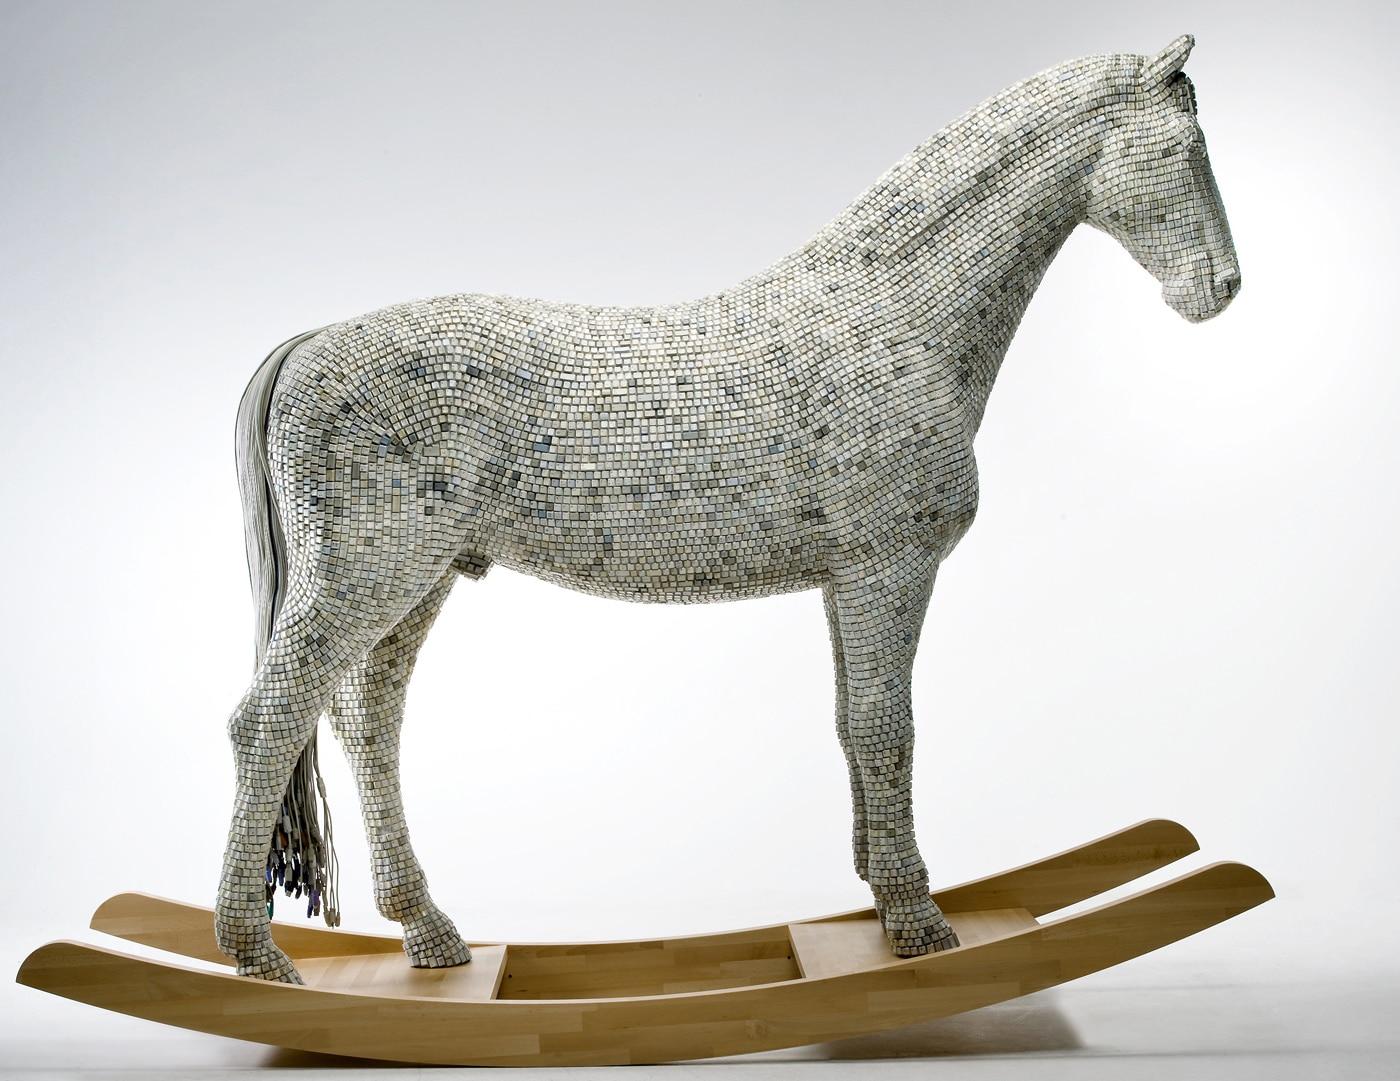 computer-keyboard-keys-trojan-horse